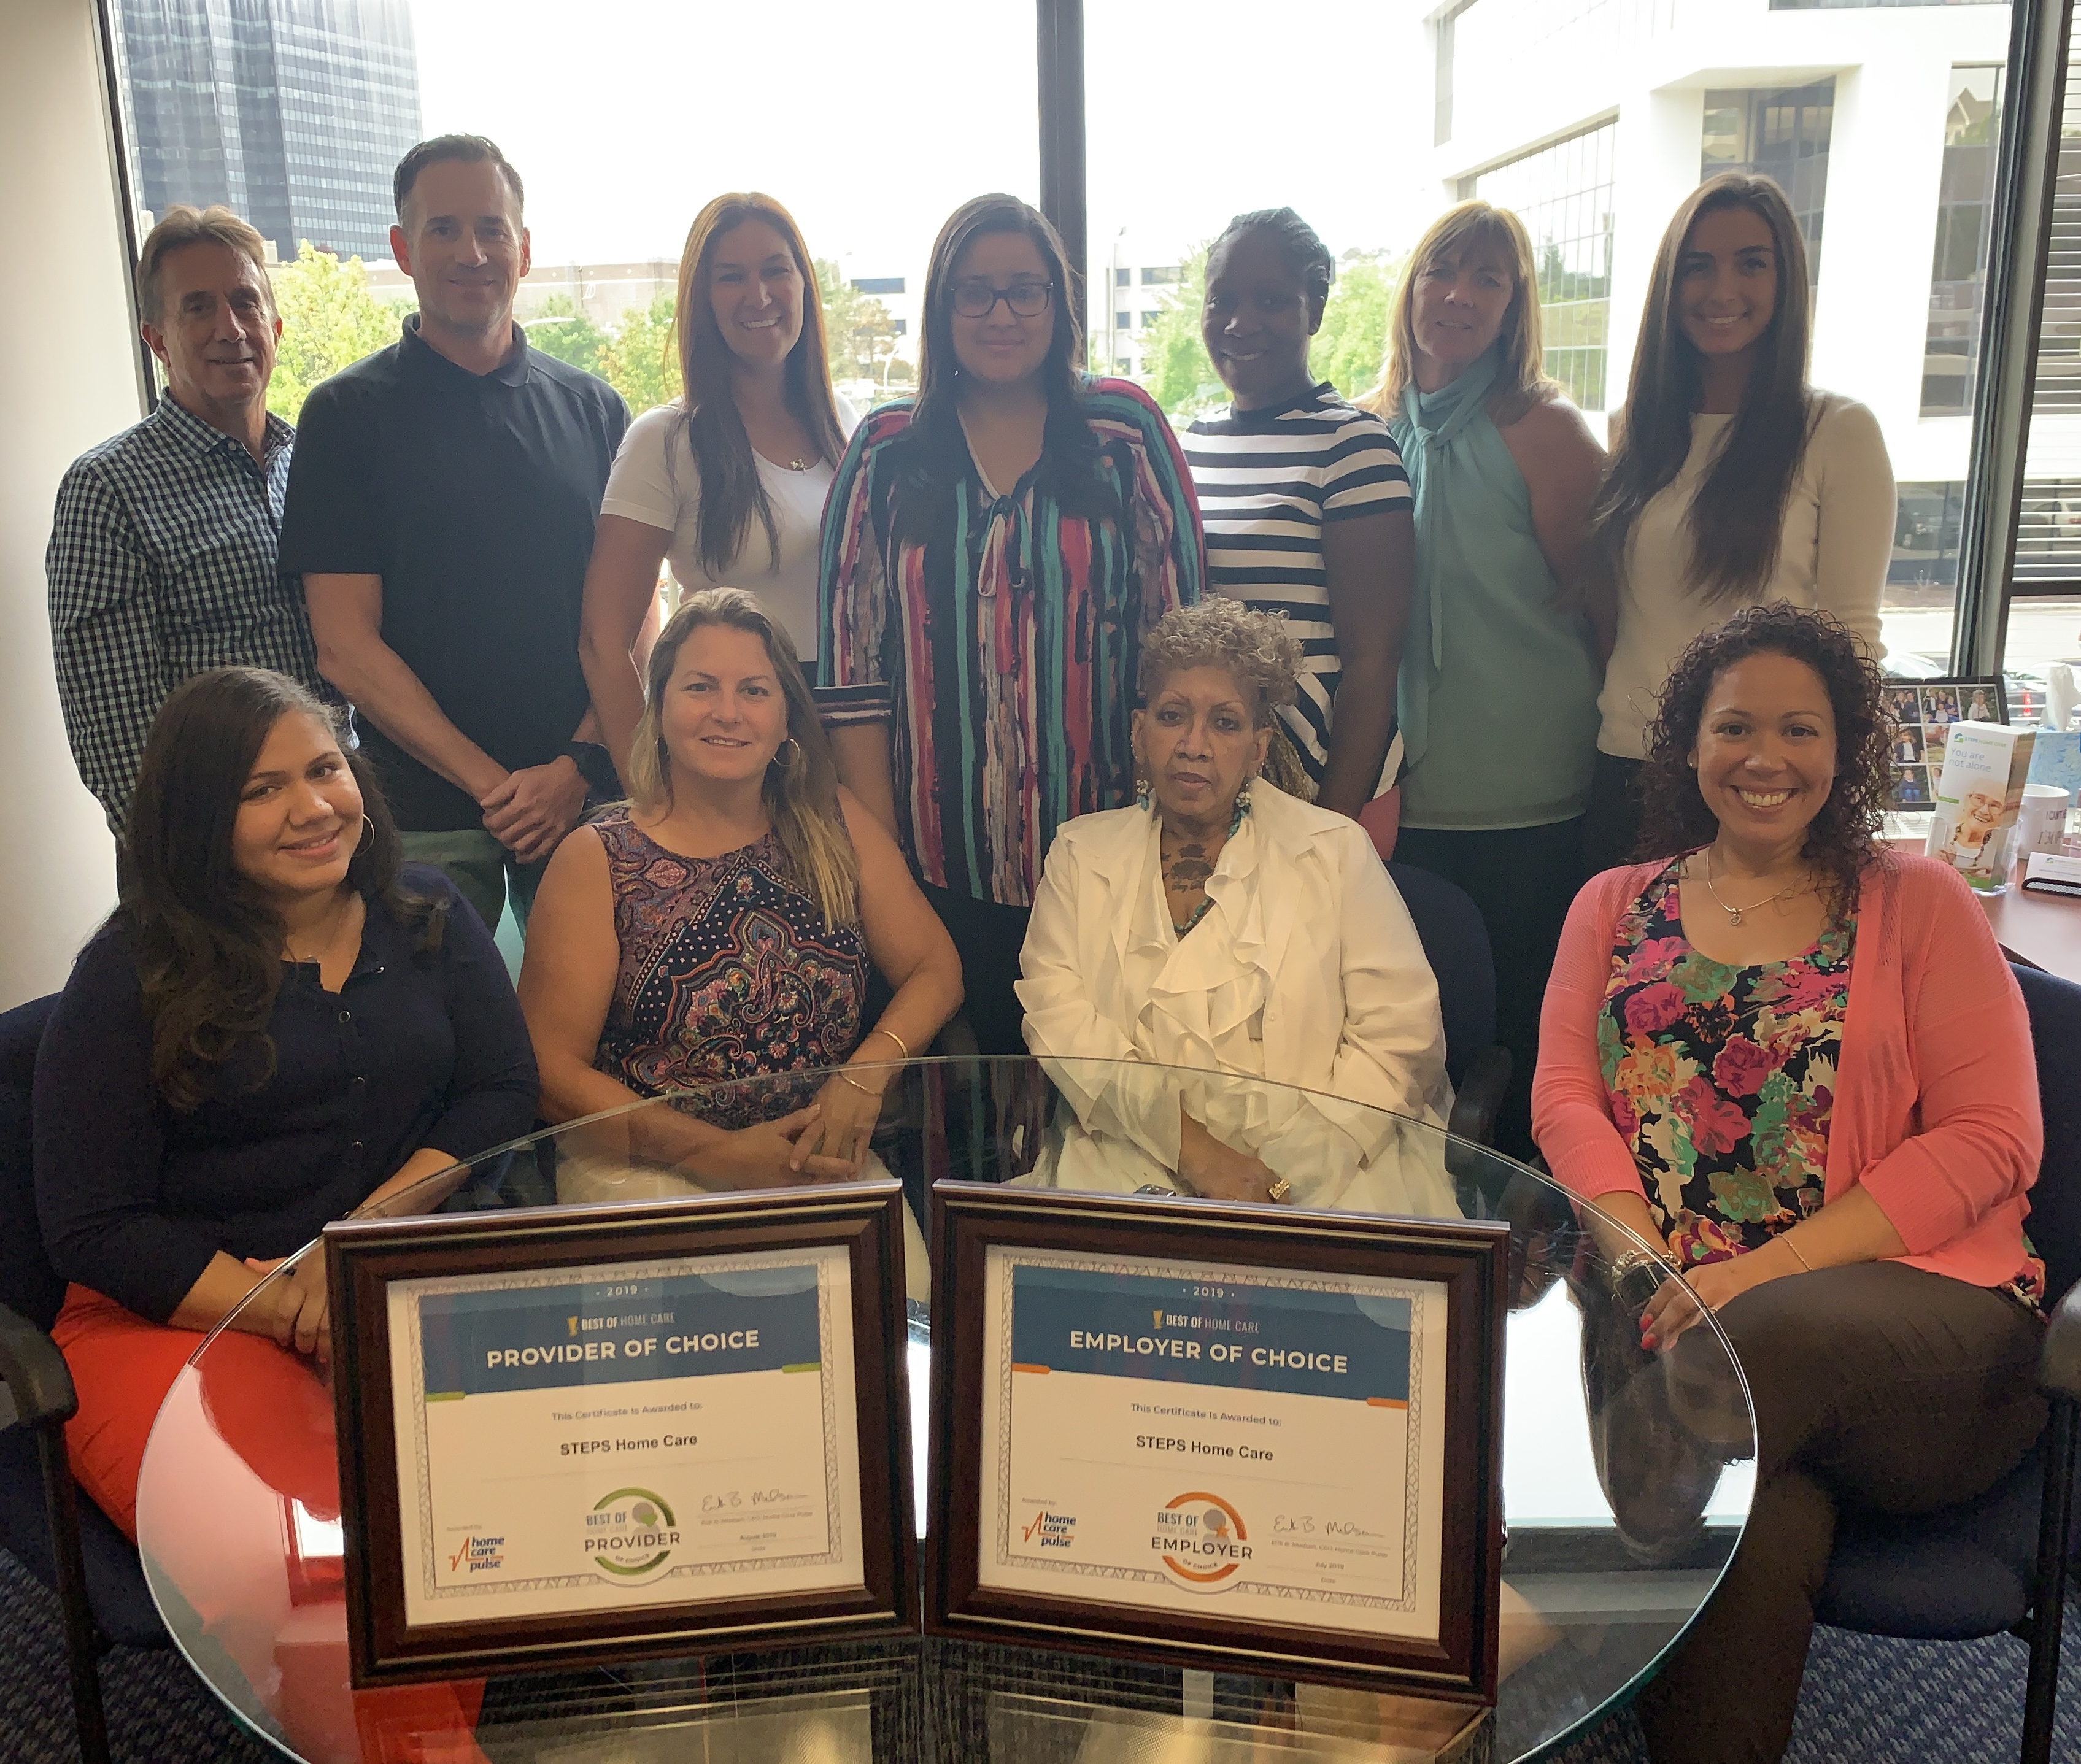 STEPS Home Care Awarded 3 Top National Home Care Awards